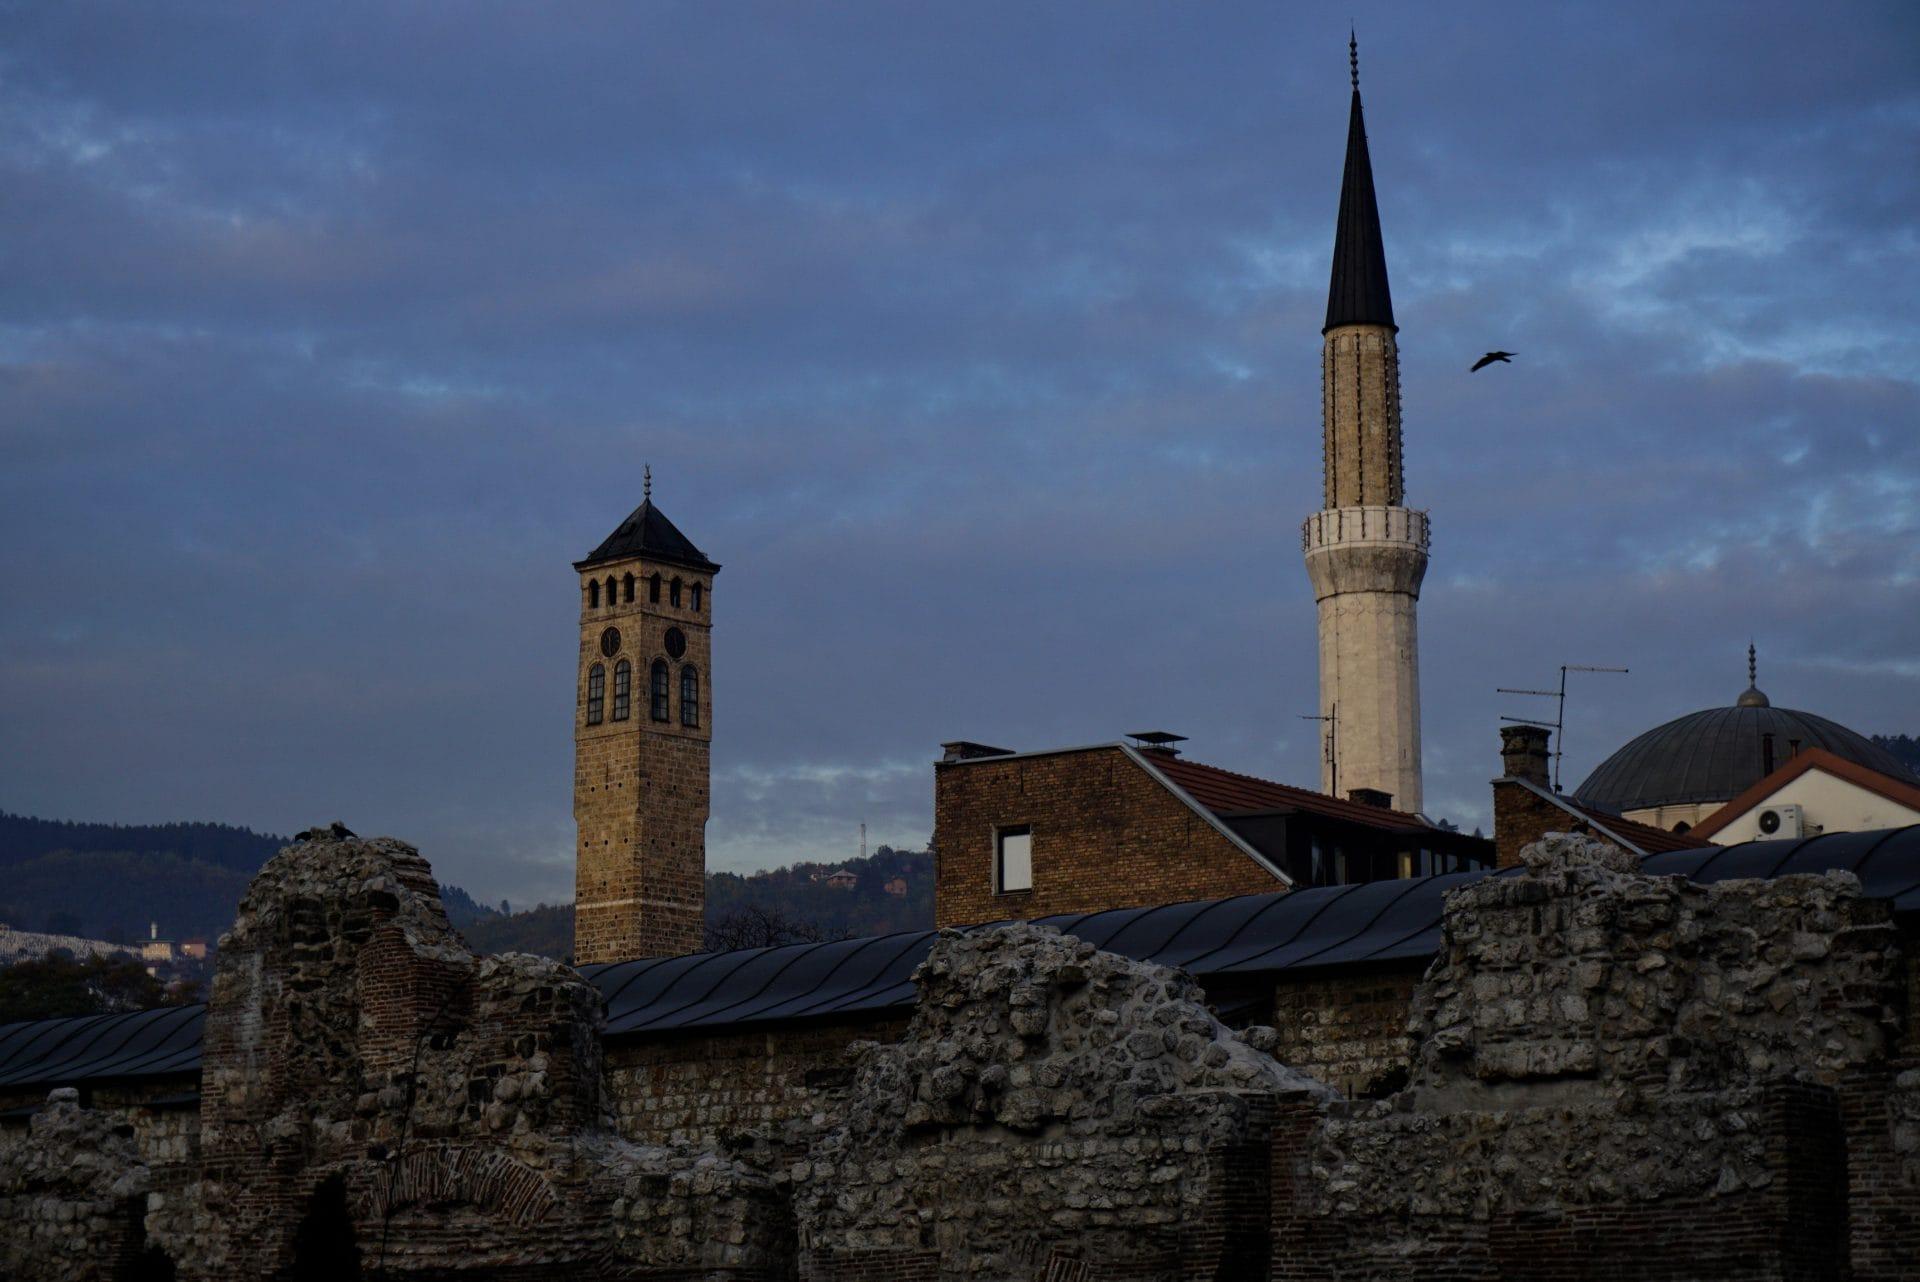 Ruins of Tašlihan Caravanserai, Sarajevo, Bosnia and Herzegovina - Experiencing the Globe